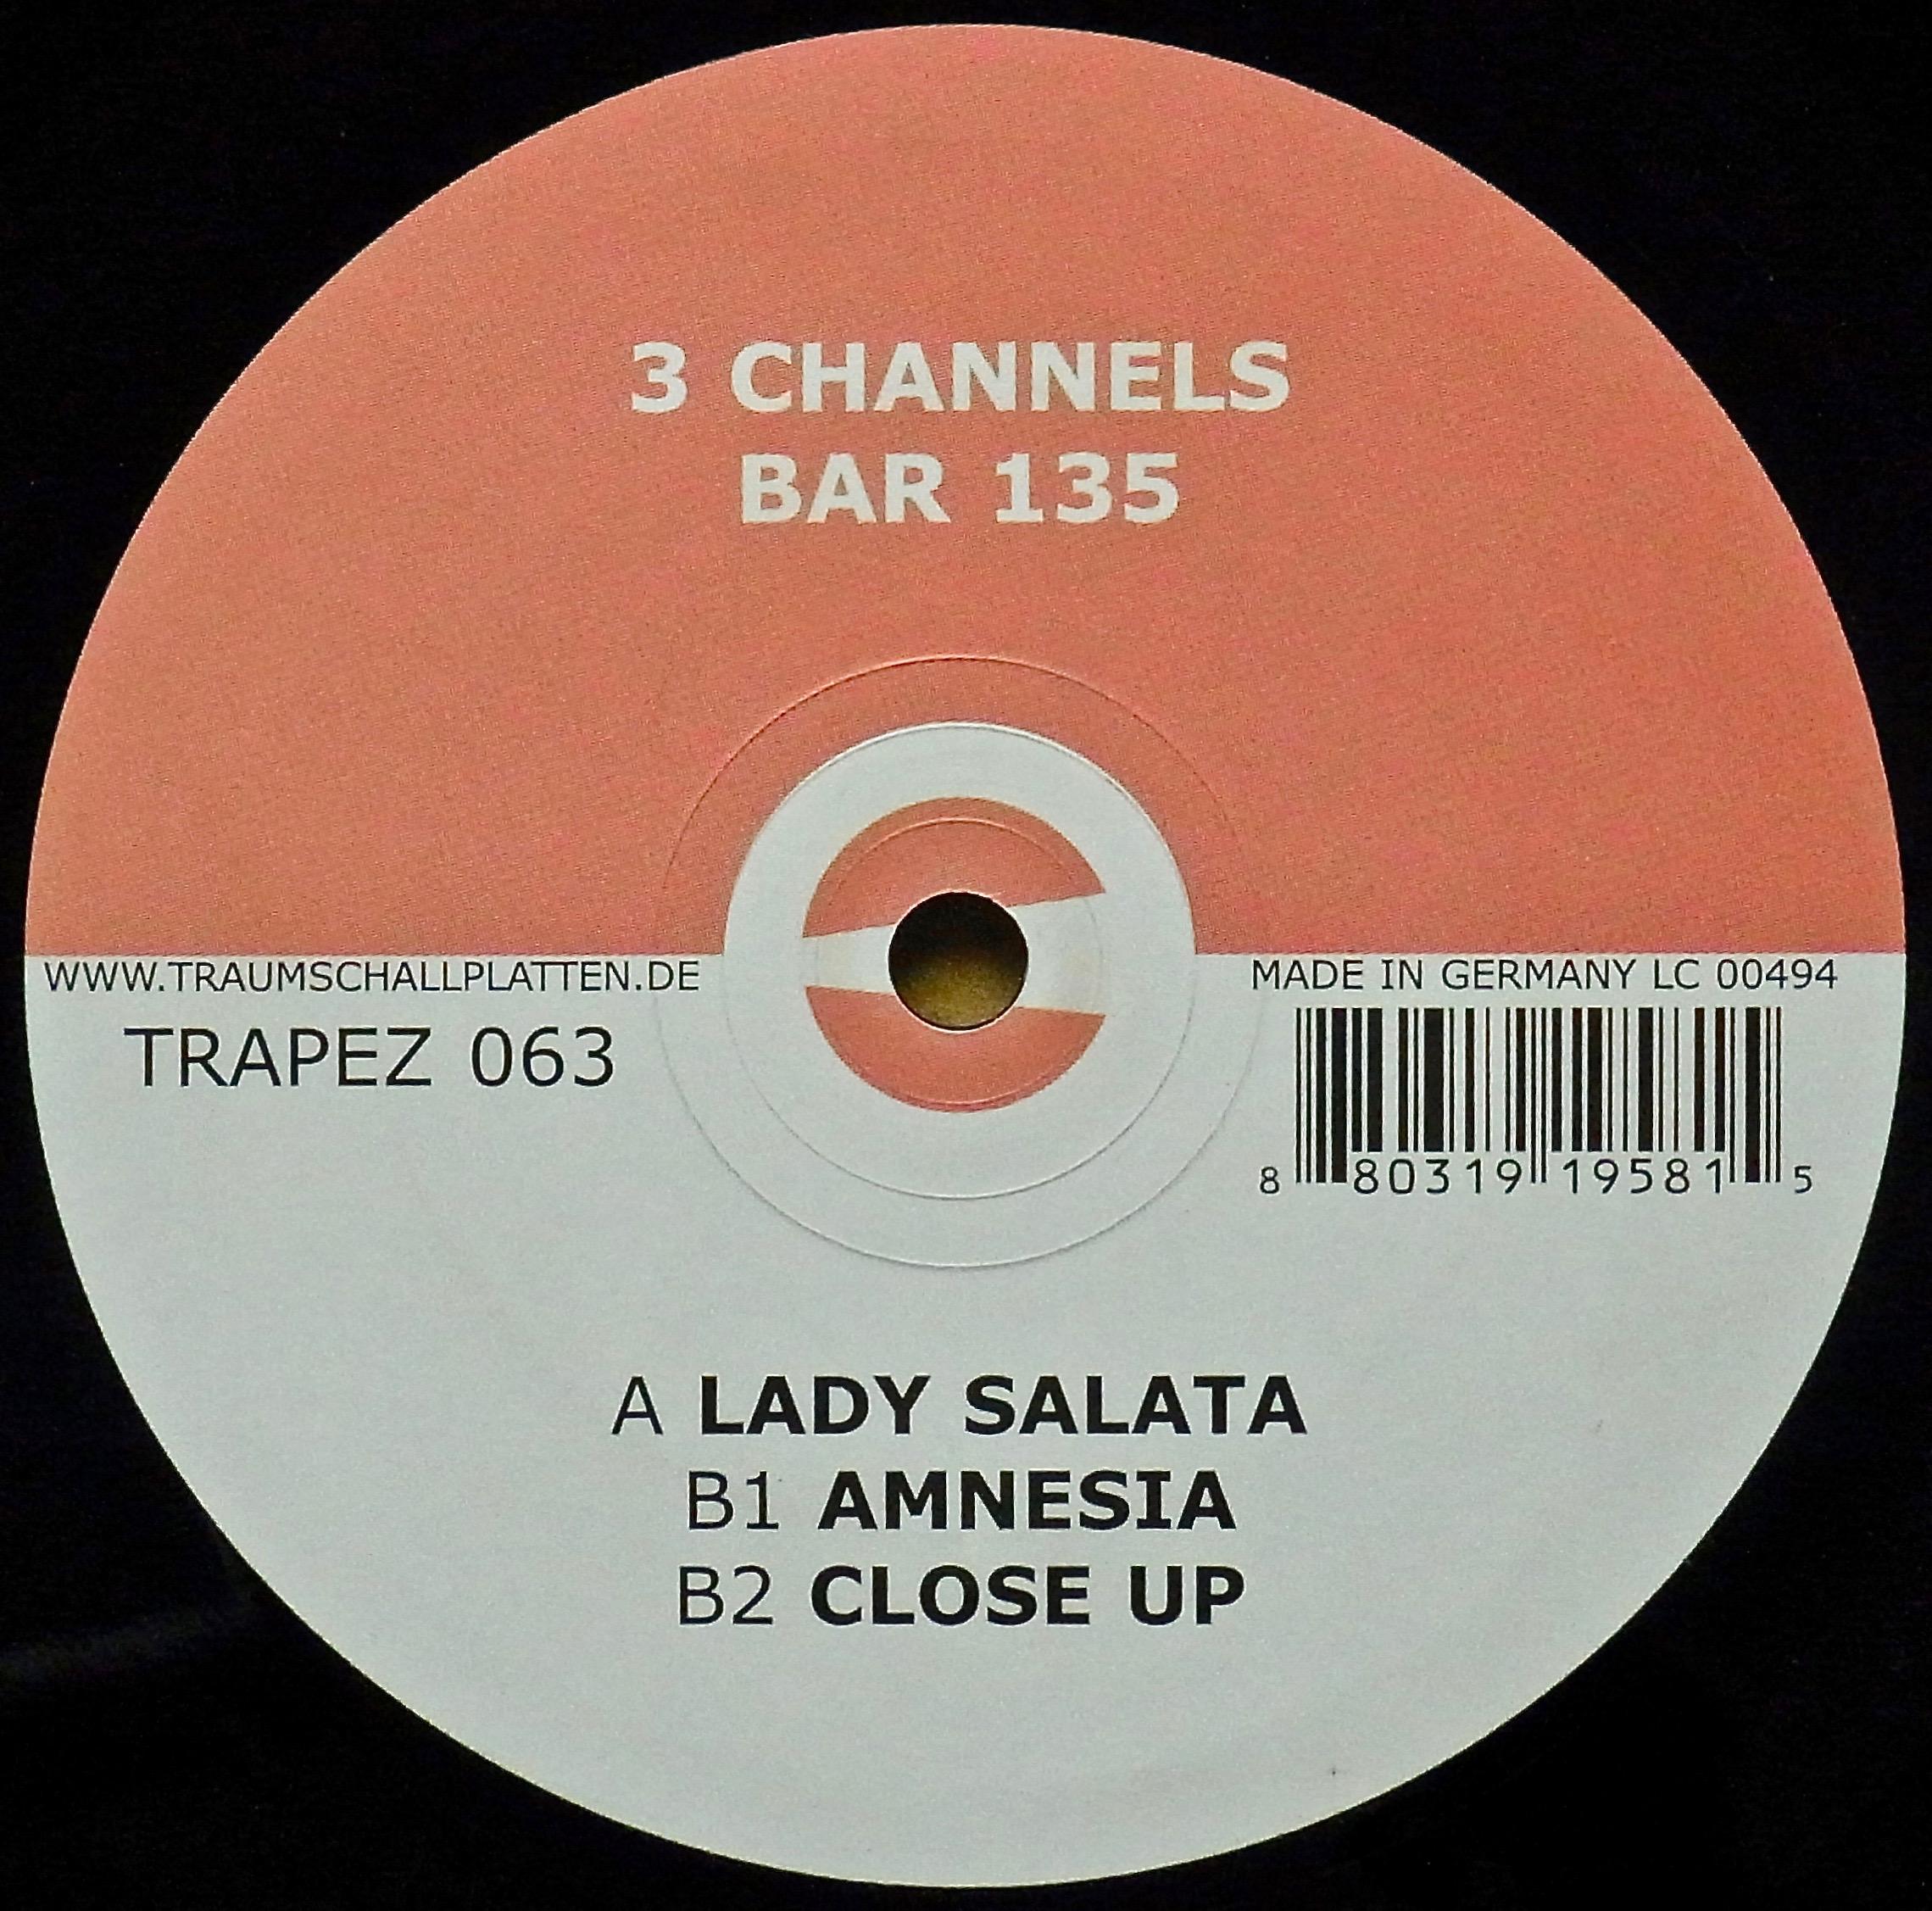 3 CHANNELS / Bar 135